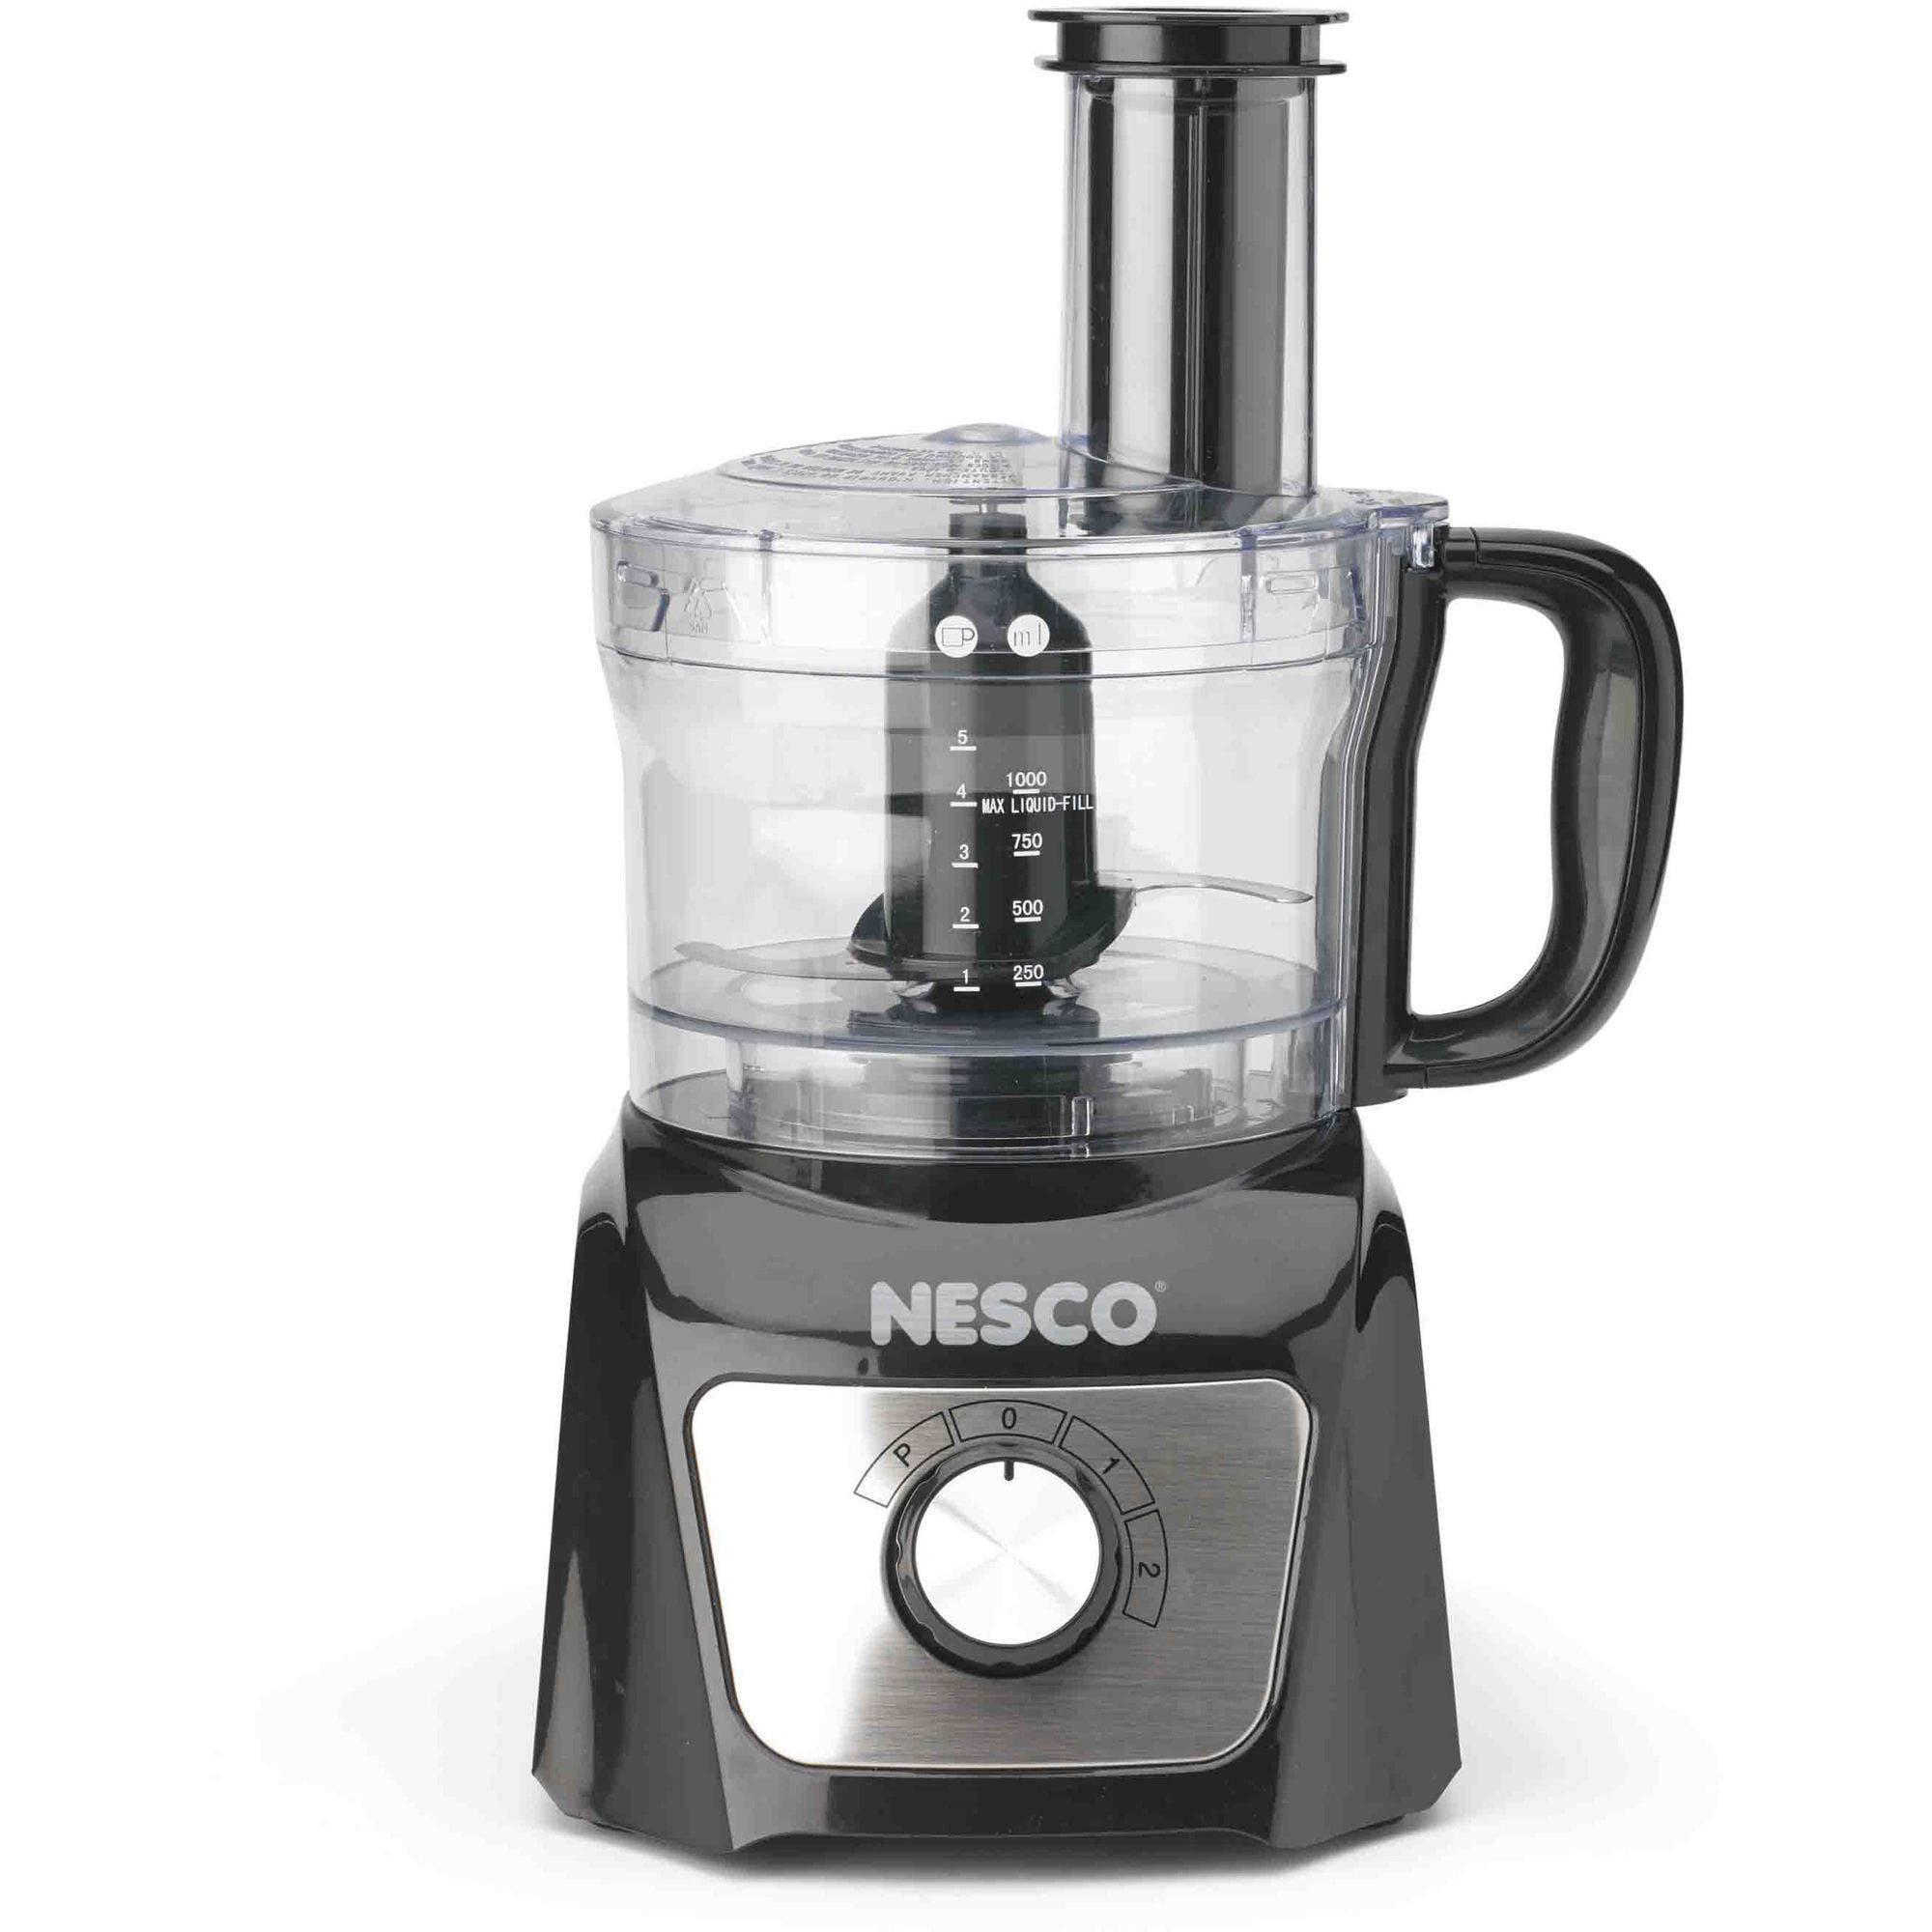 Nesco 500W 8-Cup Food Processor